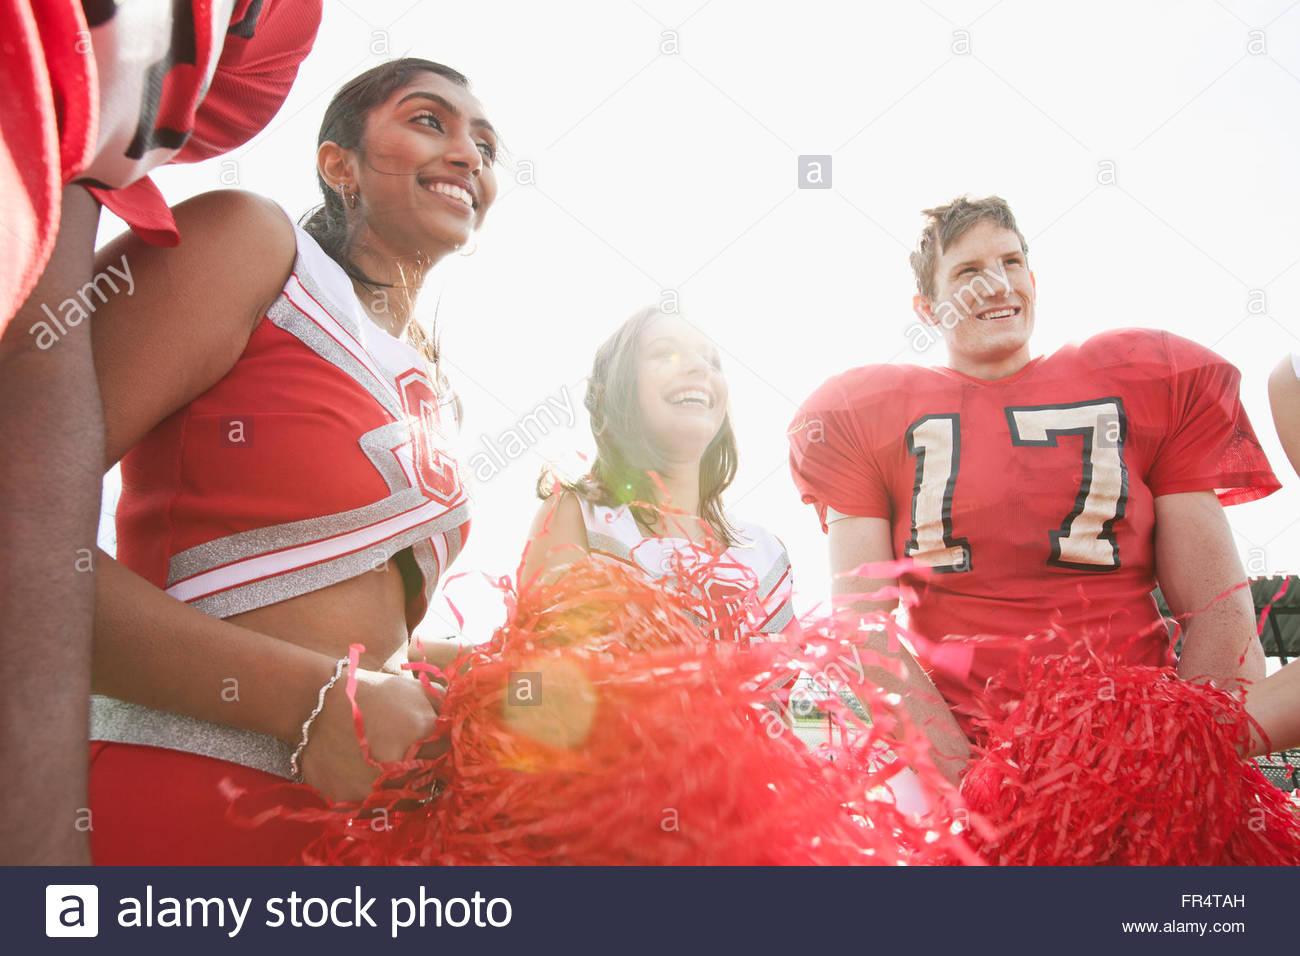 cheerleaders with football players - Stock Image